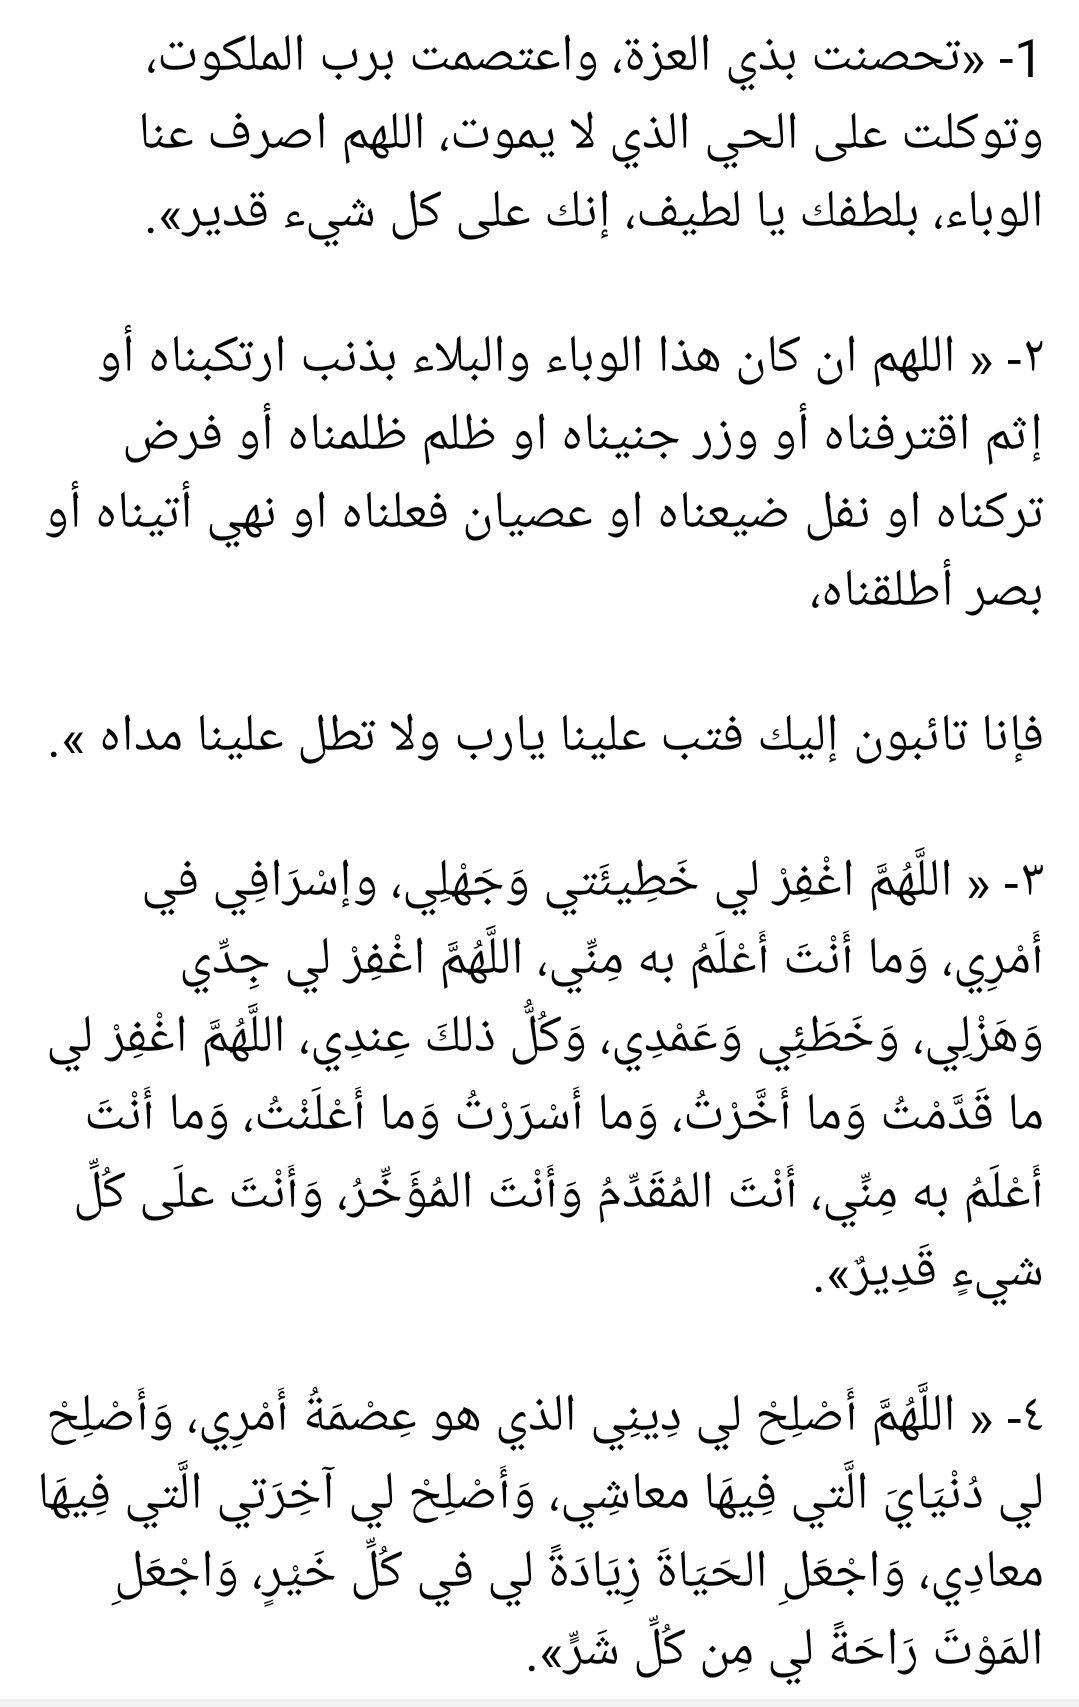 Pin By Um Leen On دعاء إلى رب غفور Islamic Quotes Islamic Quotes Quran Islam Facts